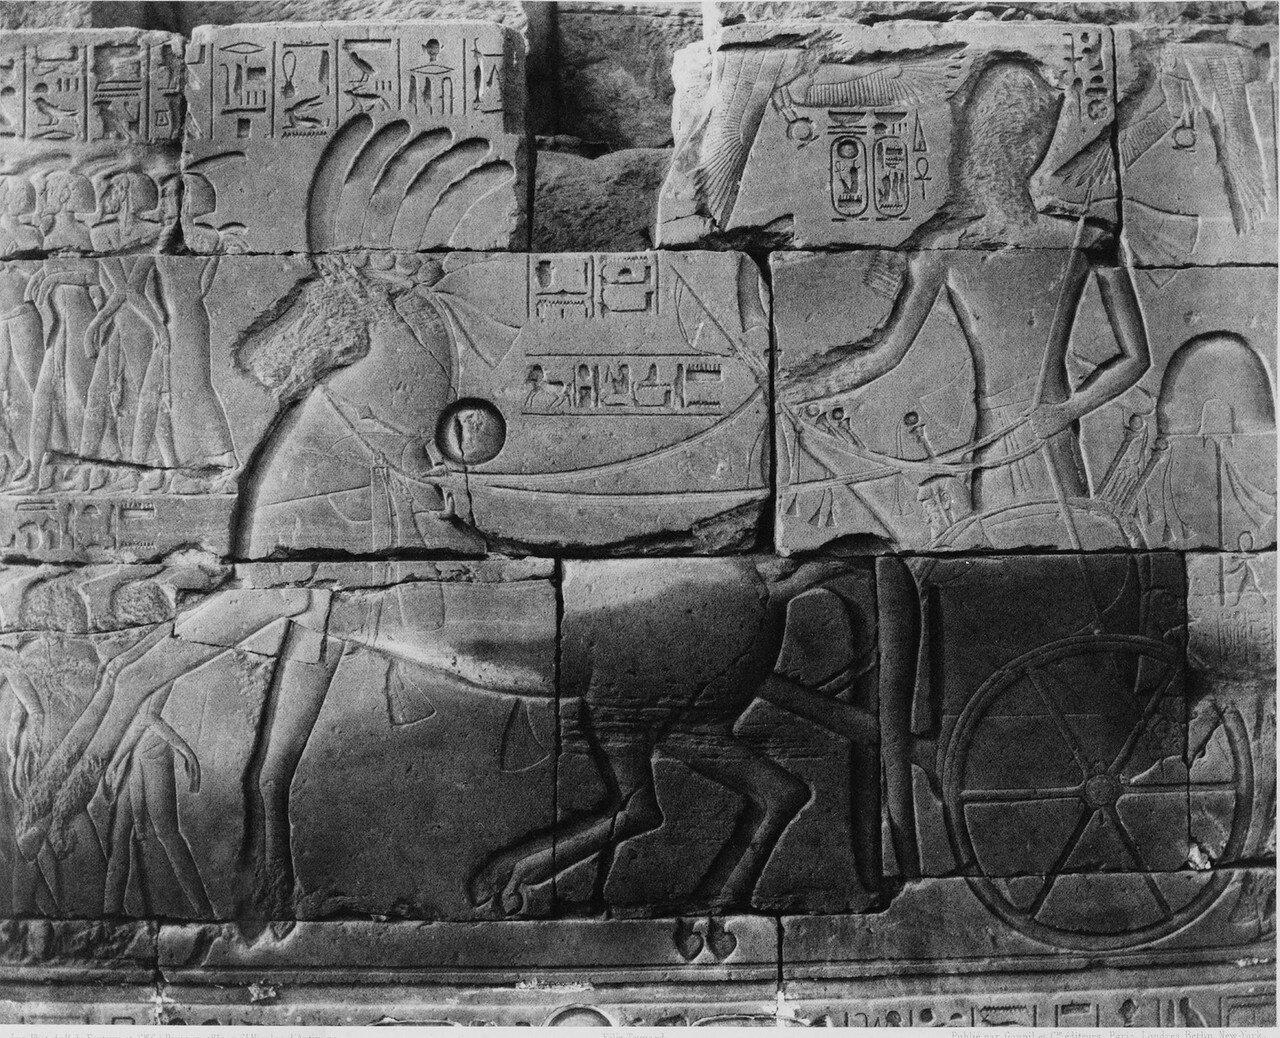 Карнак (Фивы). Роспись на стене храма. 1858